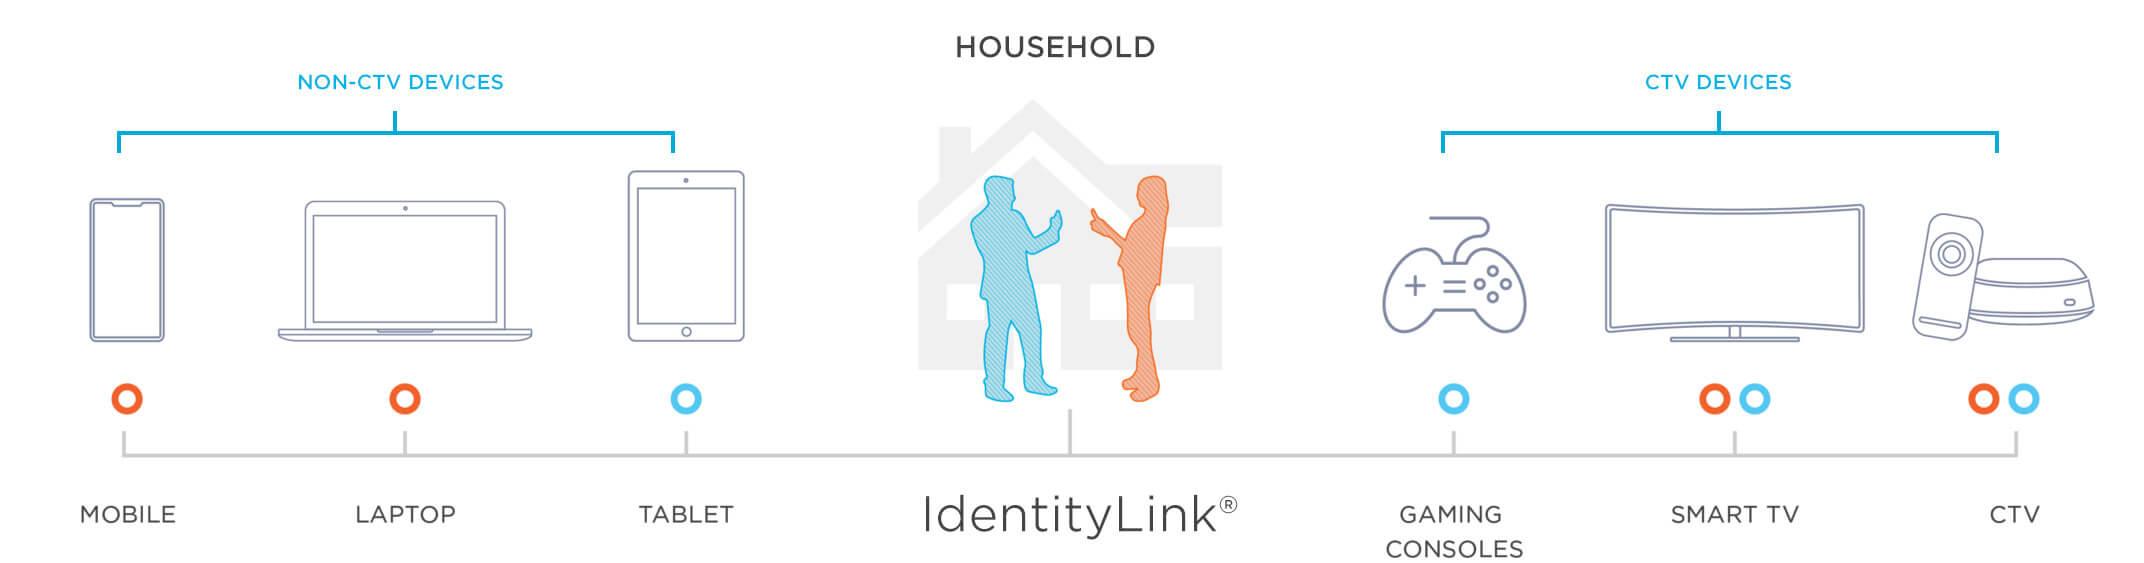 Kochava IdentityLink devices and households